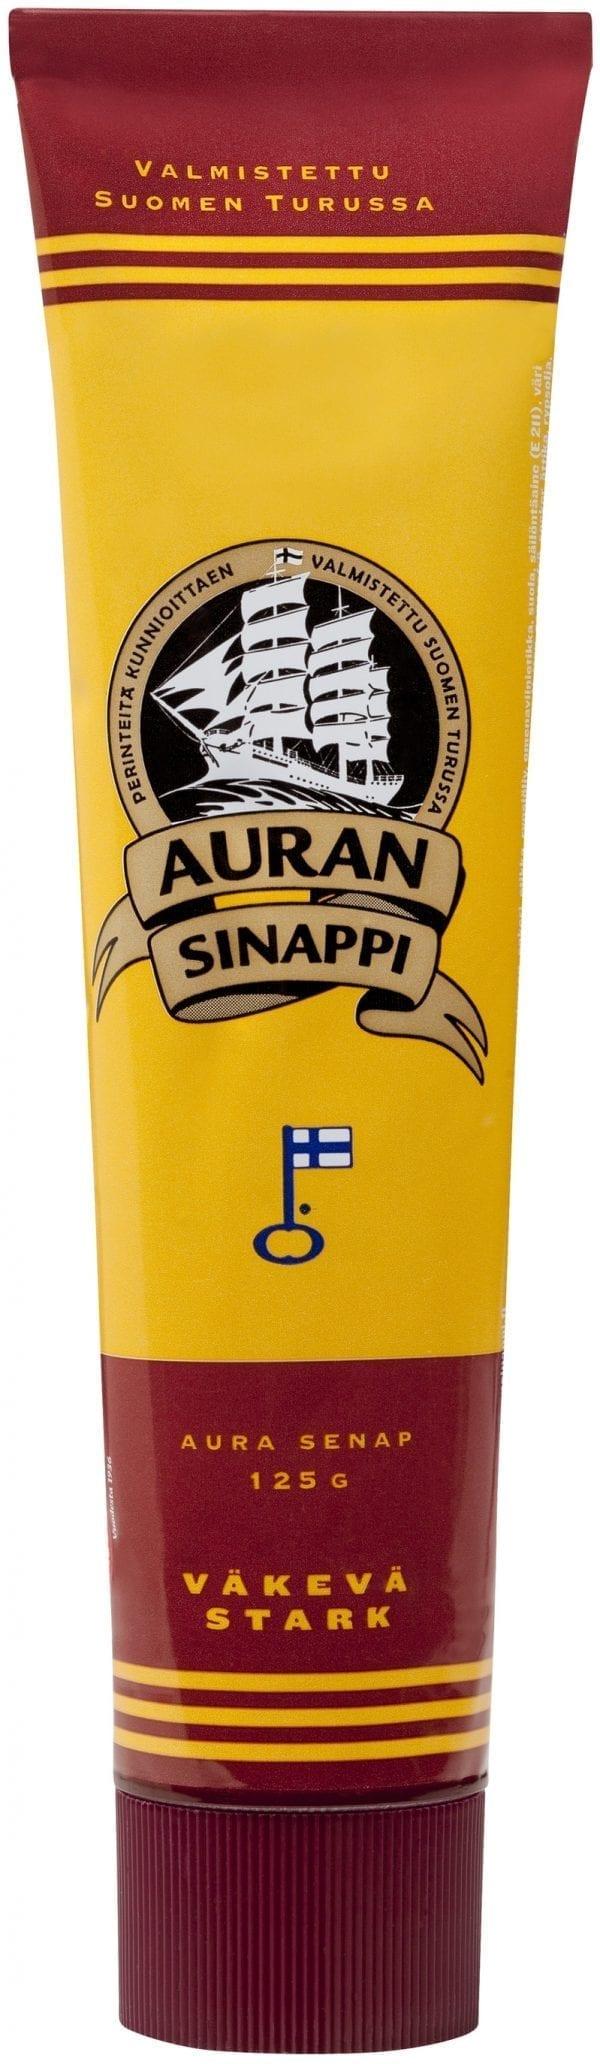 Auran Mustard Strong Turun Sinappi